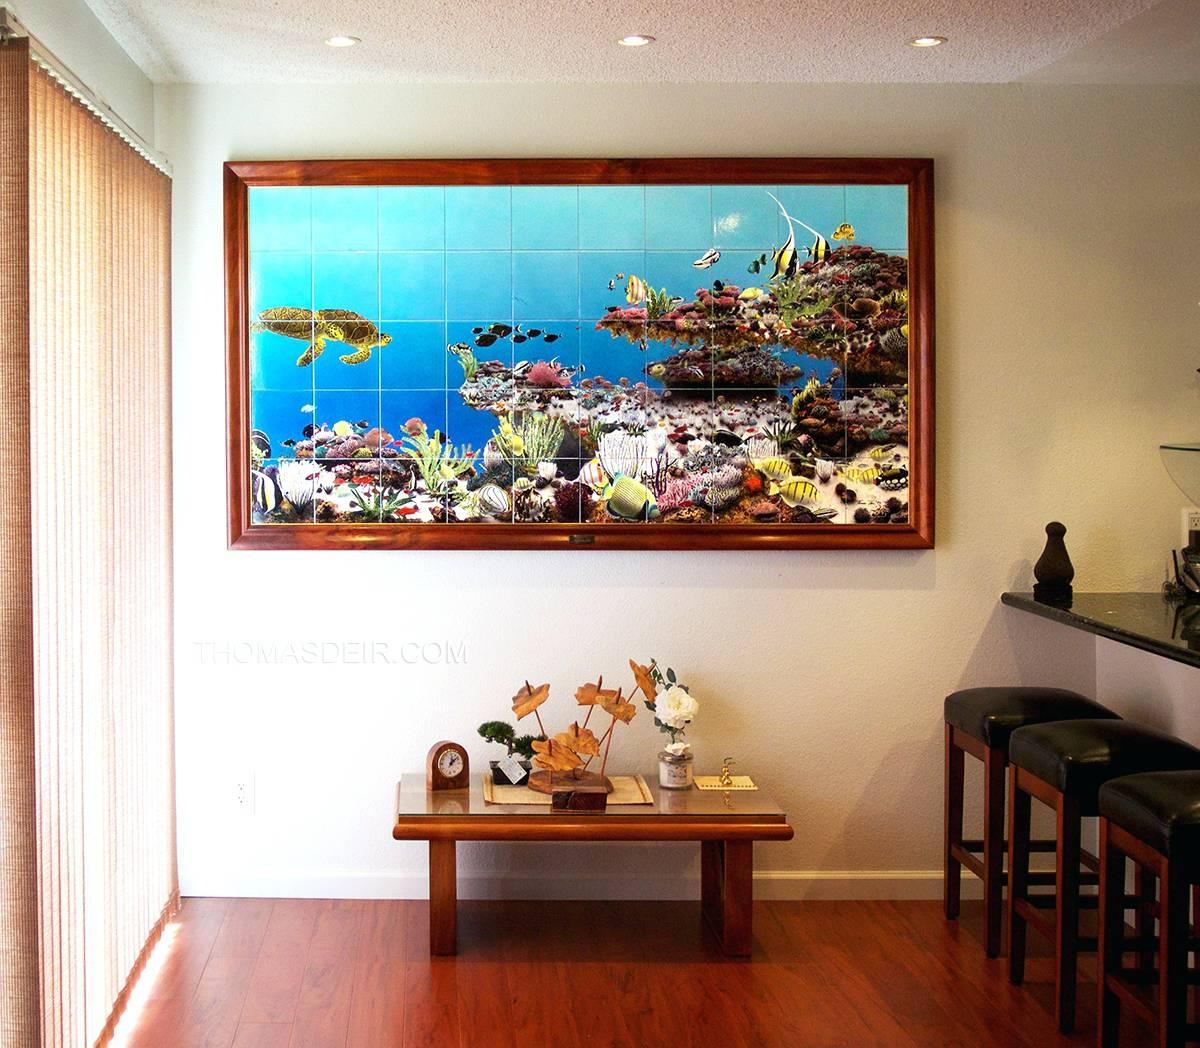 Wall Arts ~ Remarkable Wall Art For Bedroom Inspirations Hawaii With Regard To Recent Hawaiian Metal Wall Art (View 10 of 20)